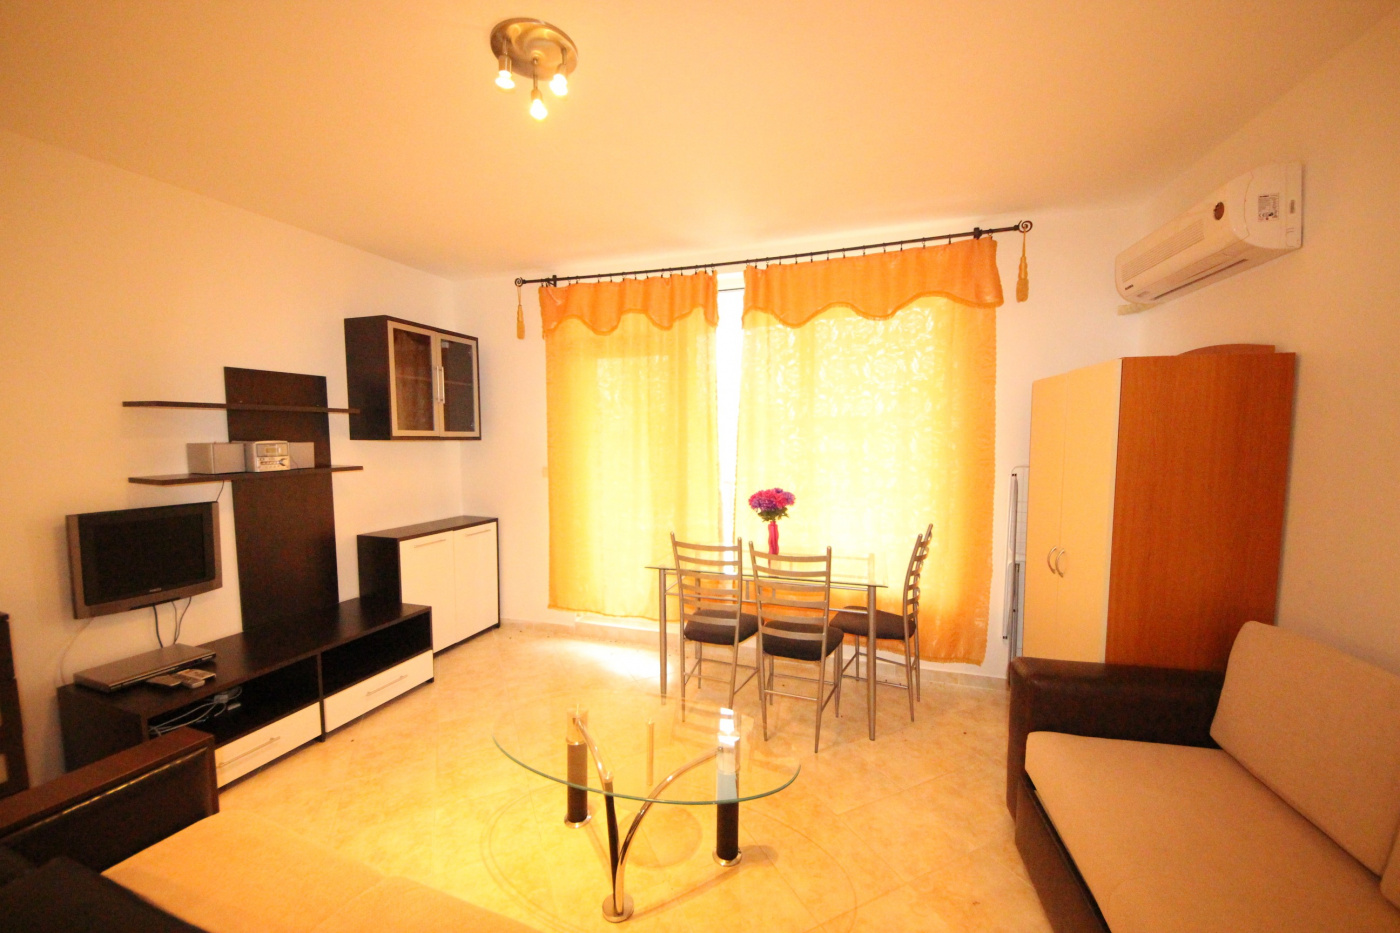 Sunset II Kosharitsa apartament 75